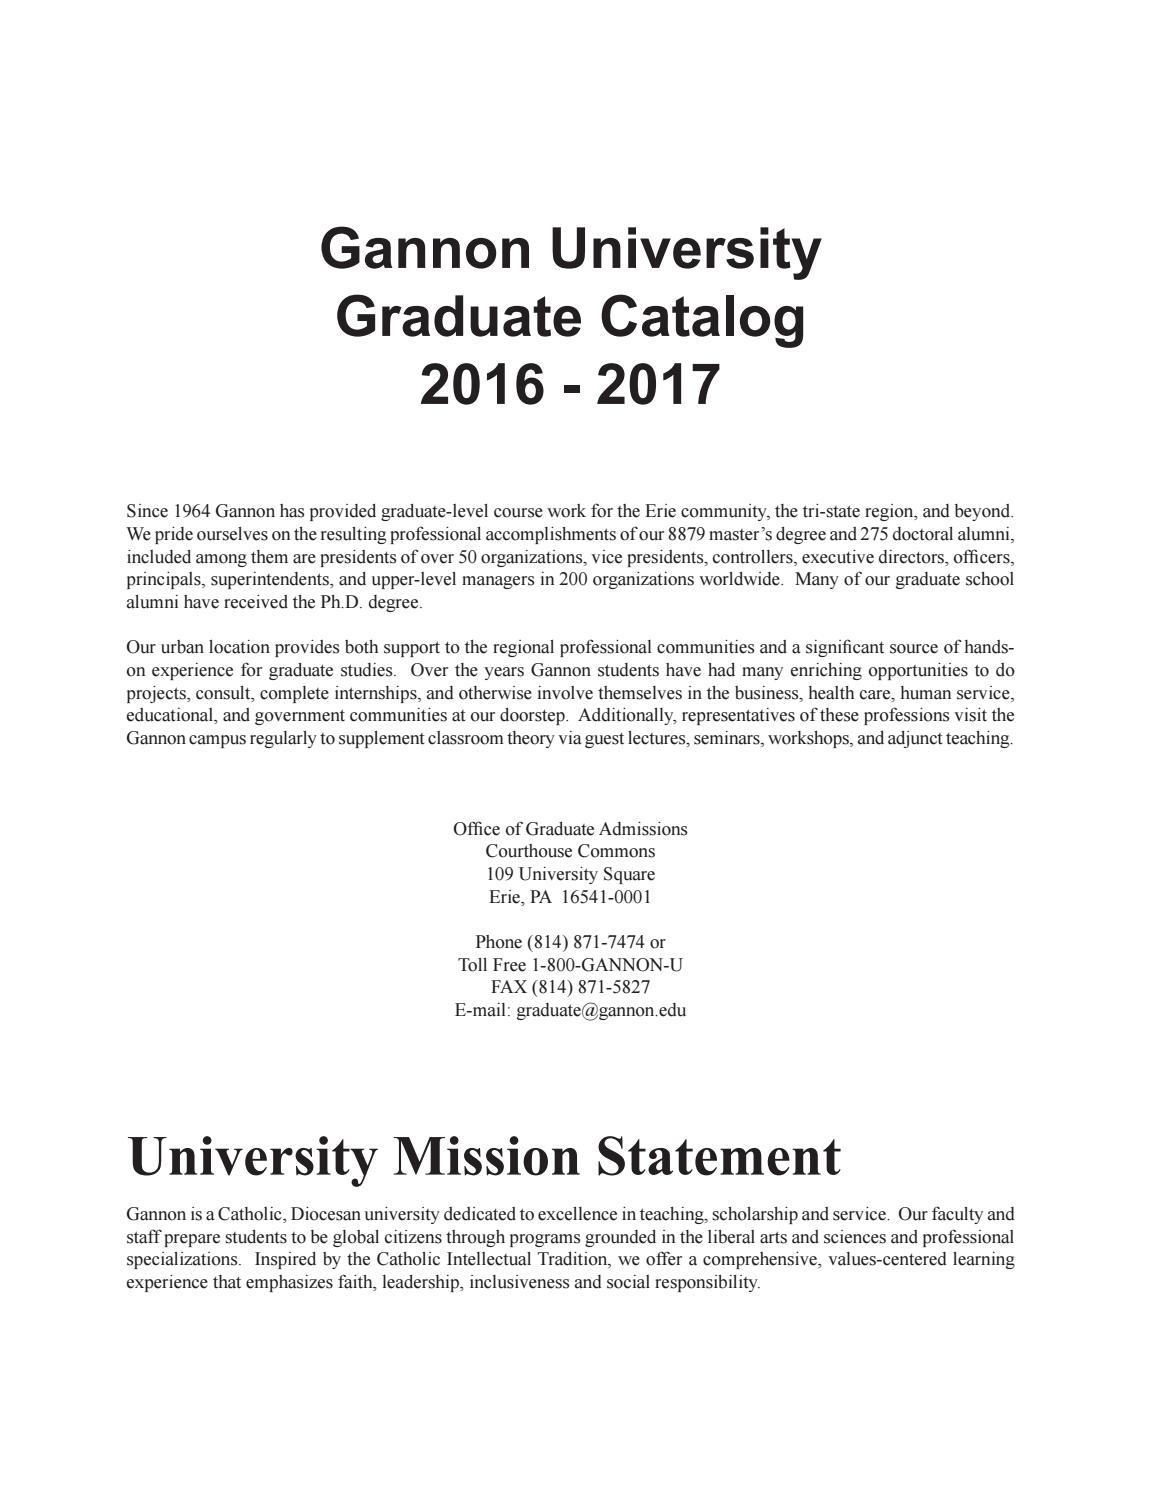 20491e9f0db Gannon University Graduate Catalog 16-17 by Gannon University - issuu